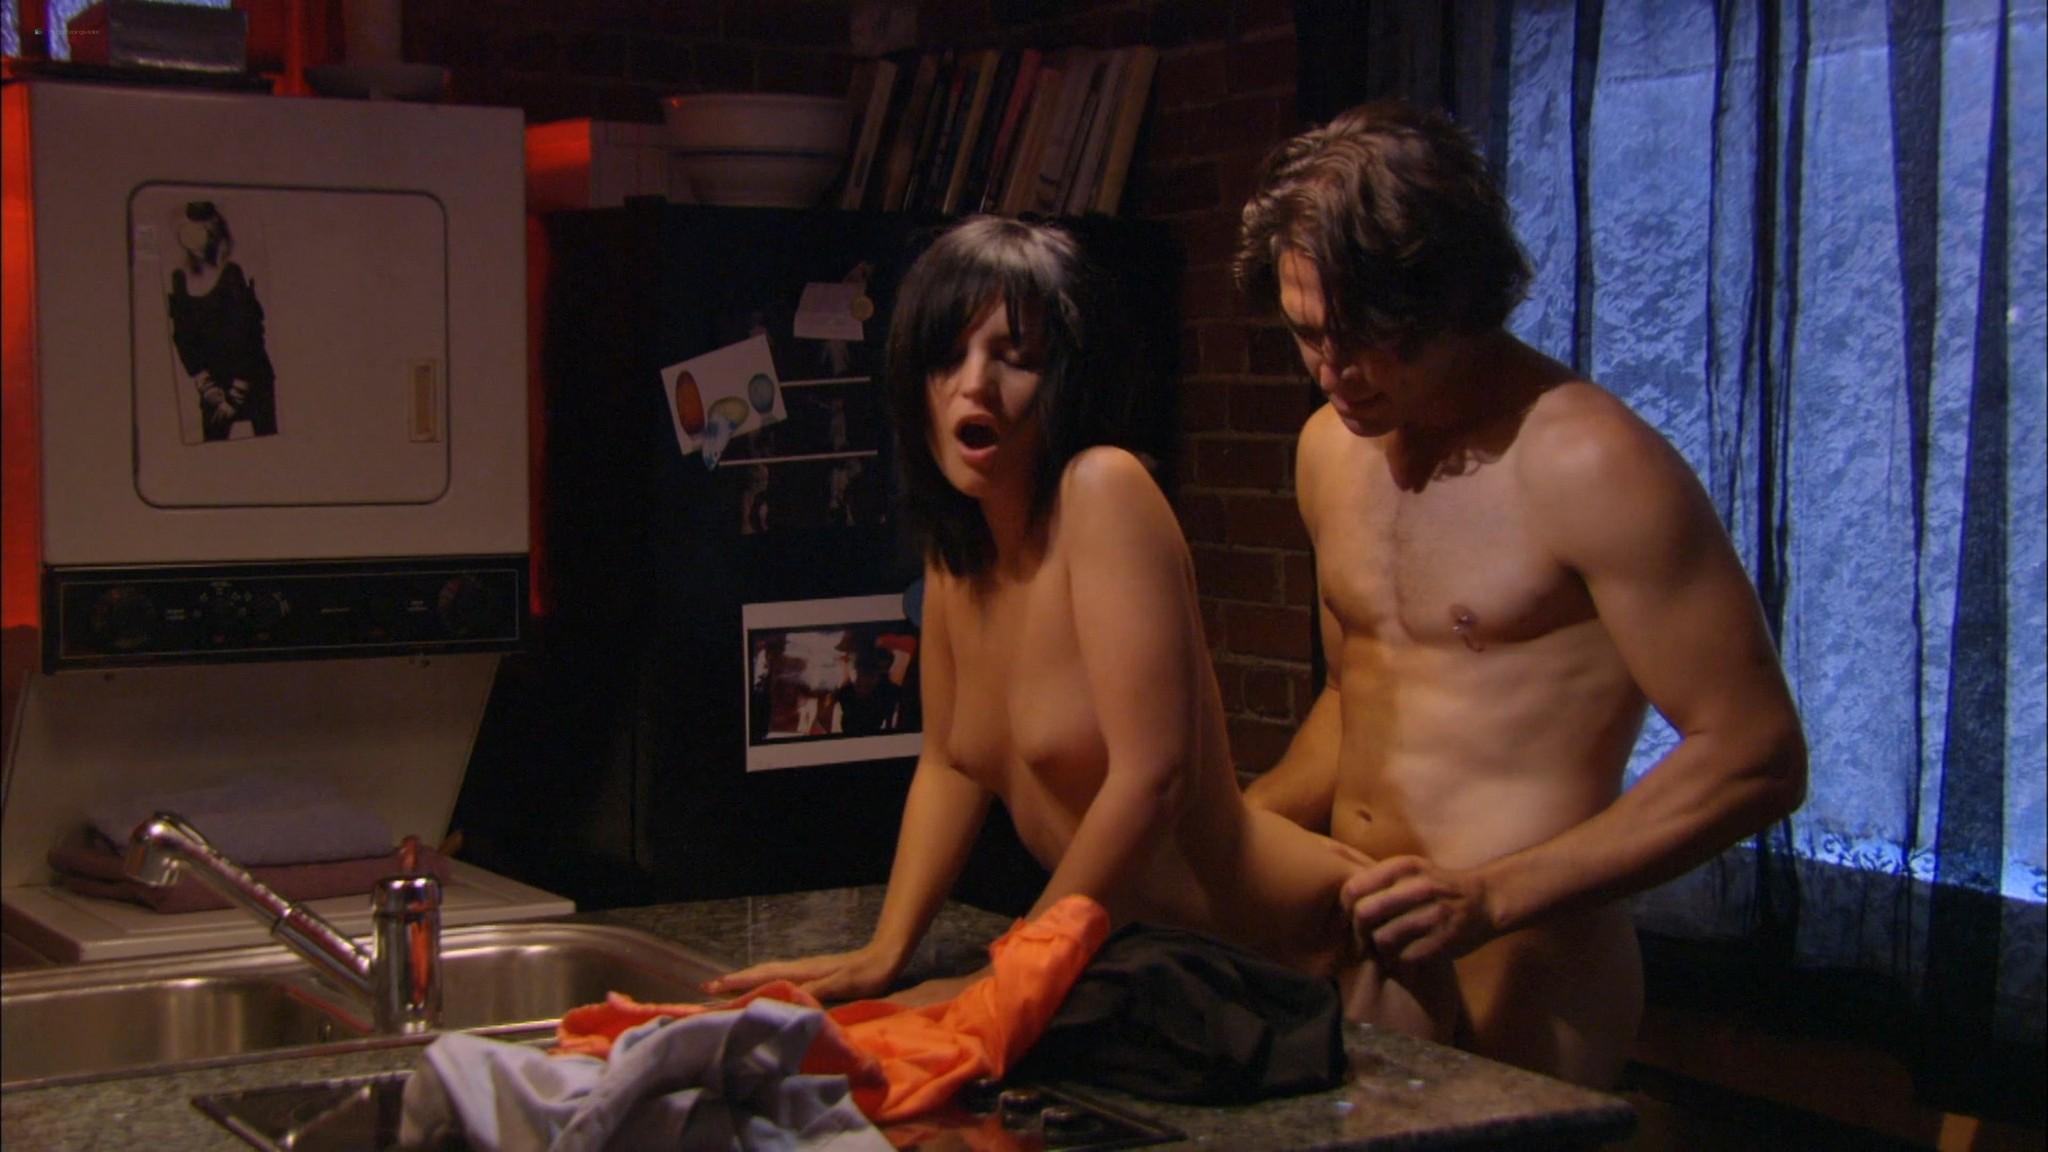 Lana Tailor nude sex Albina Nahar Denise Cobar nude sex Lingerie 2010 HD 1080p 014